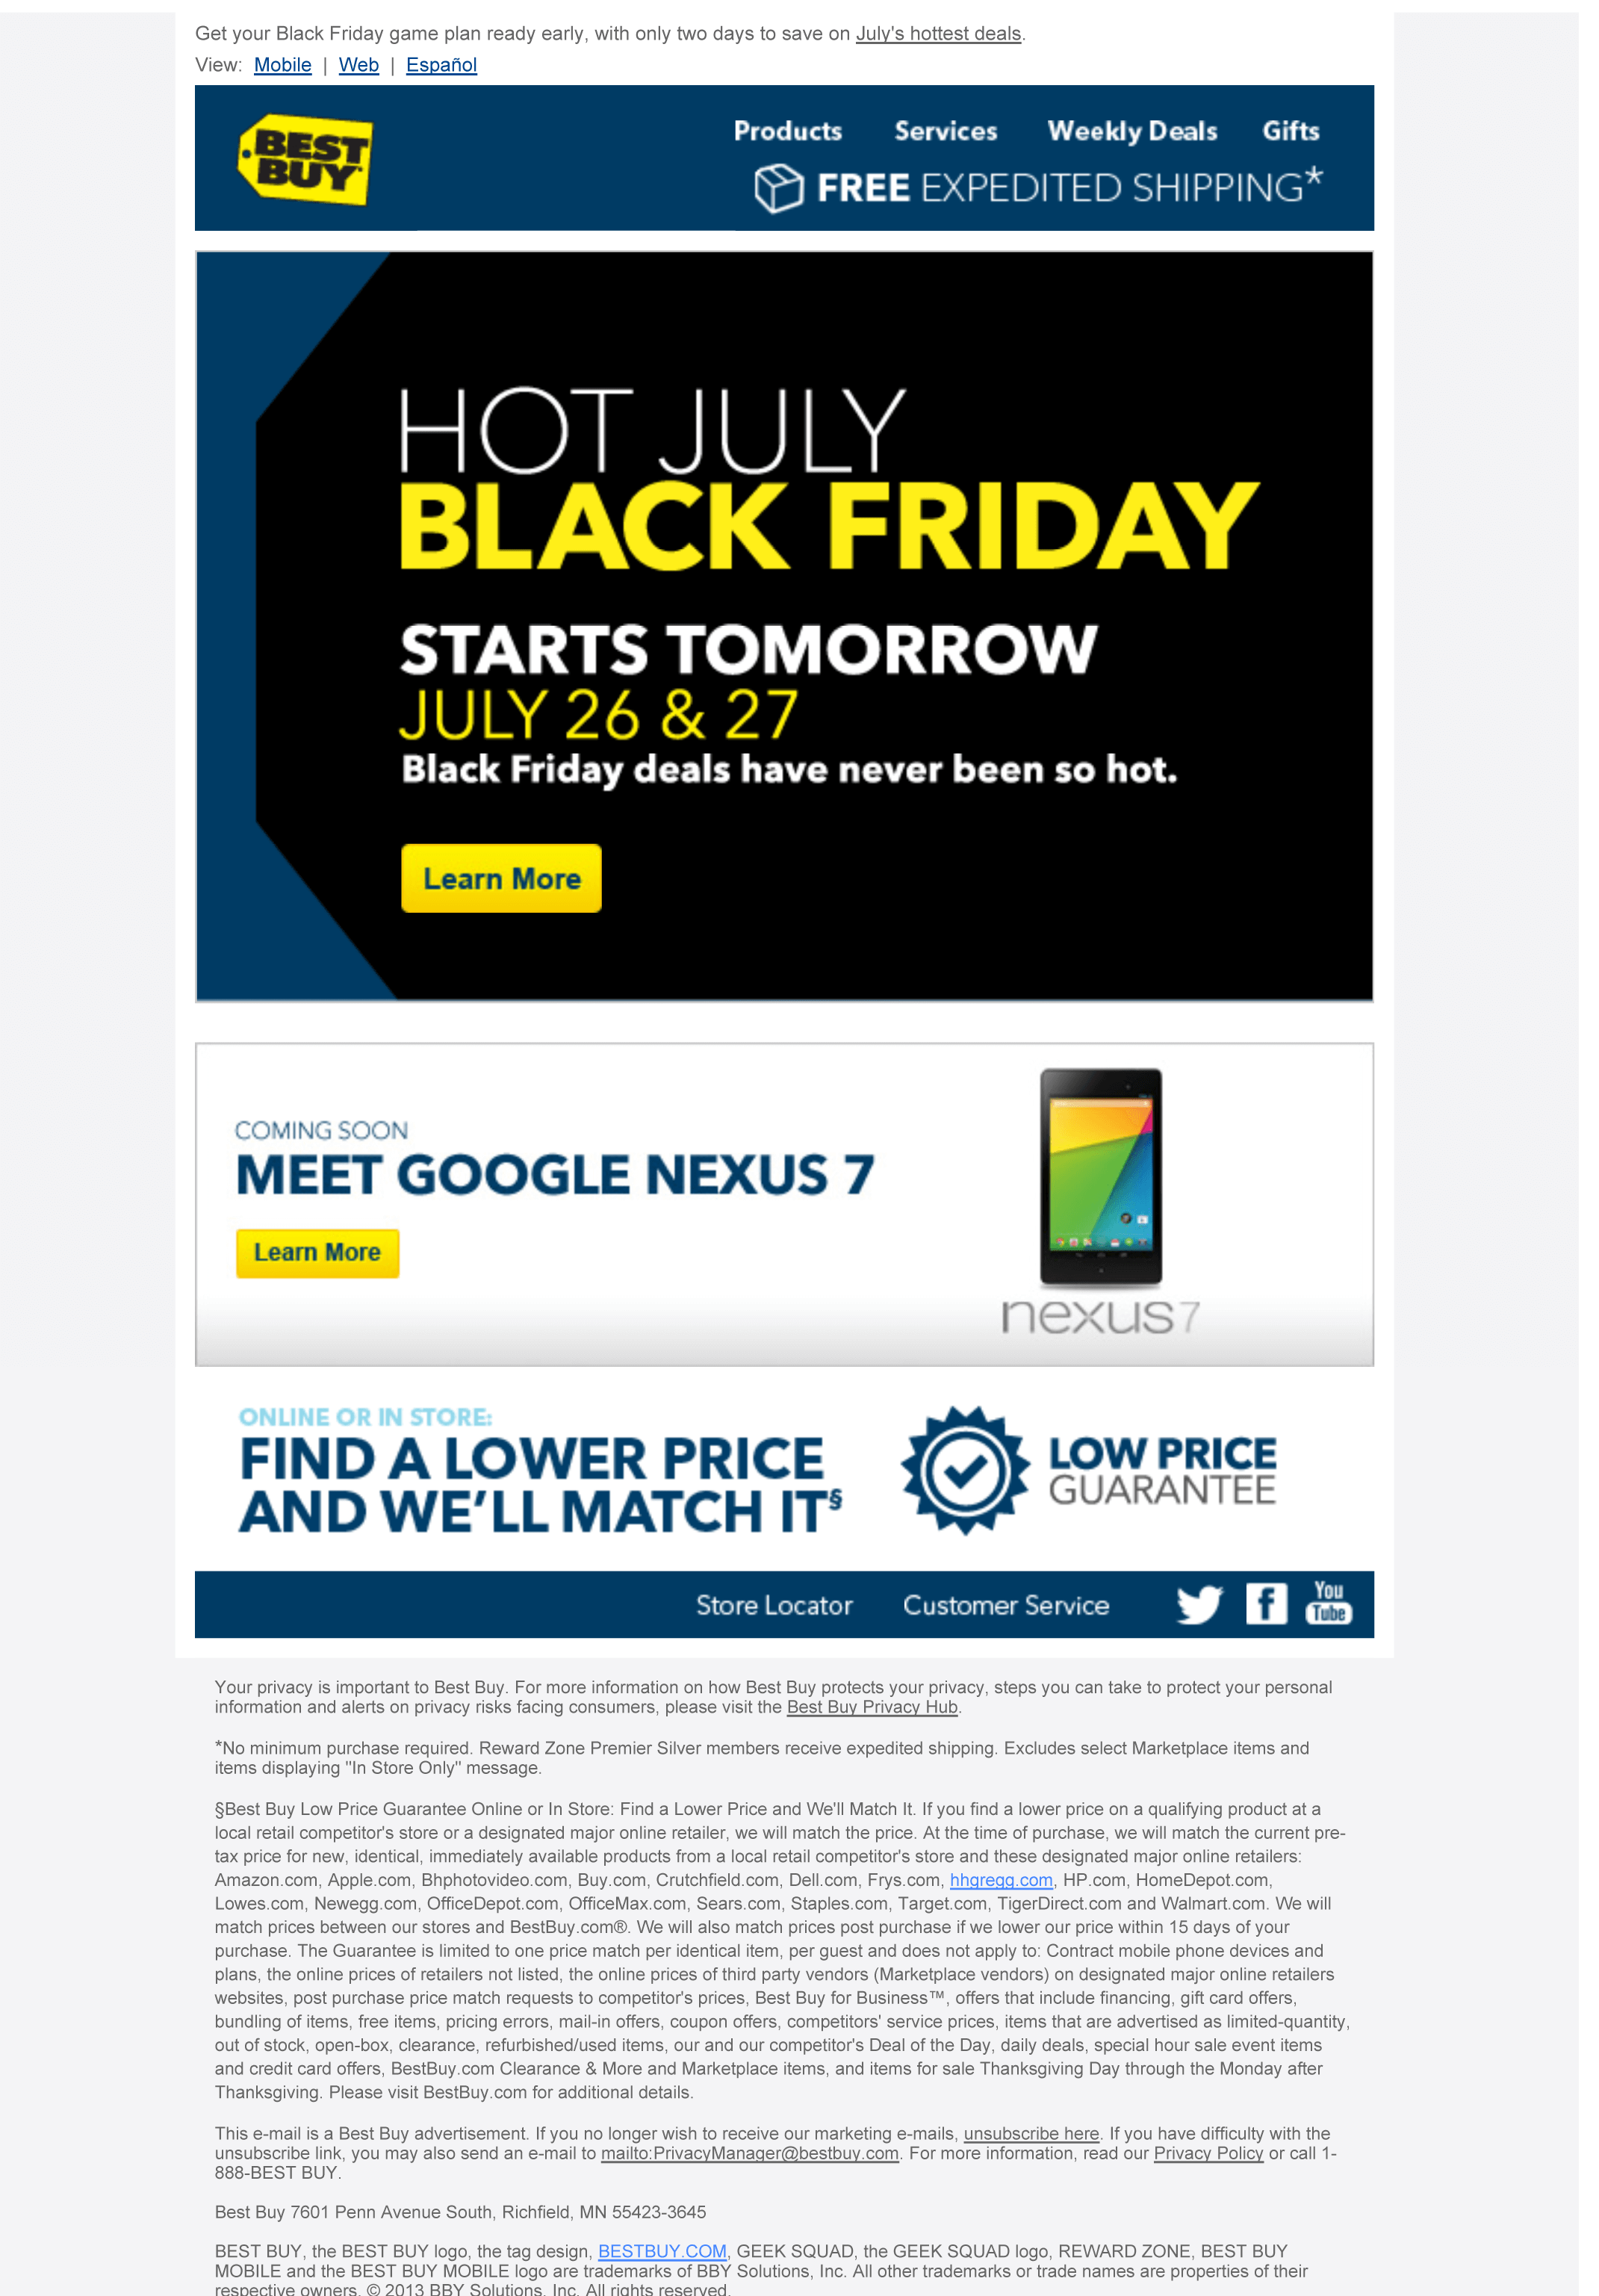 Best Buy - Black Friday